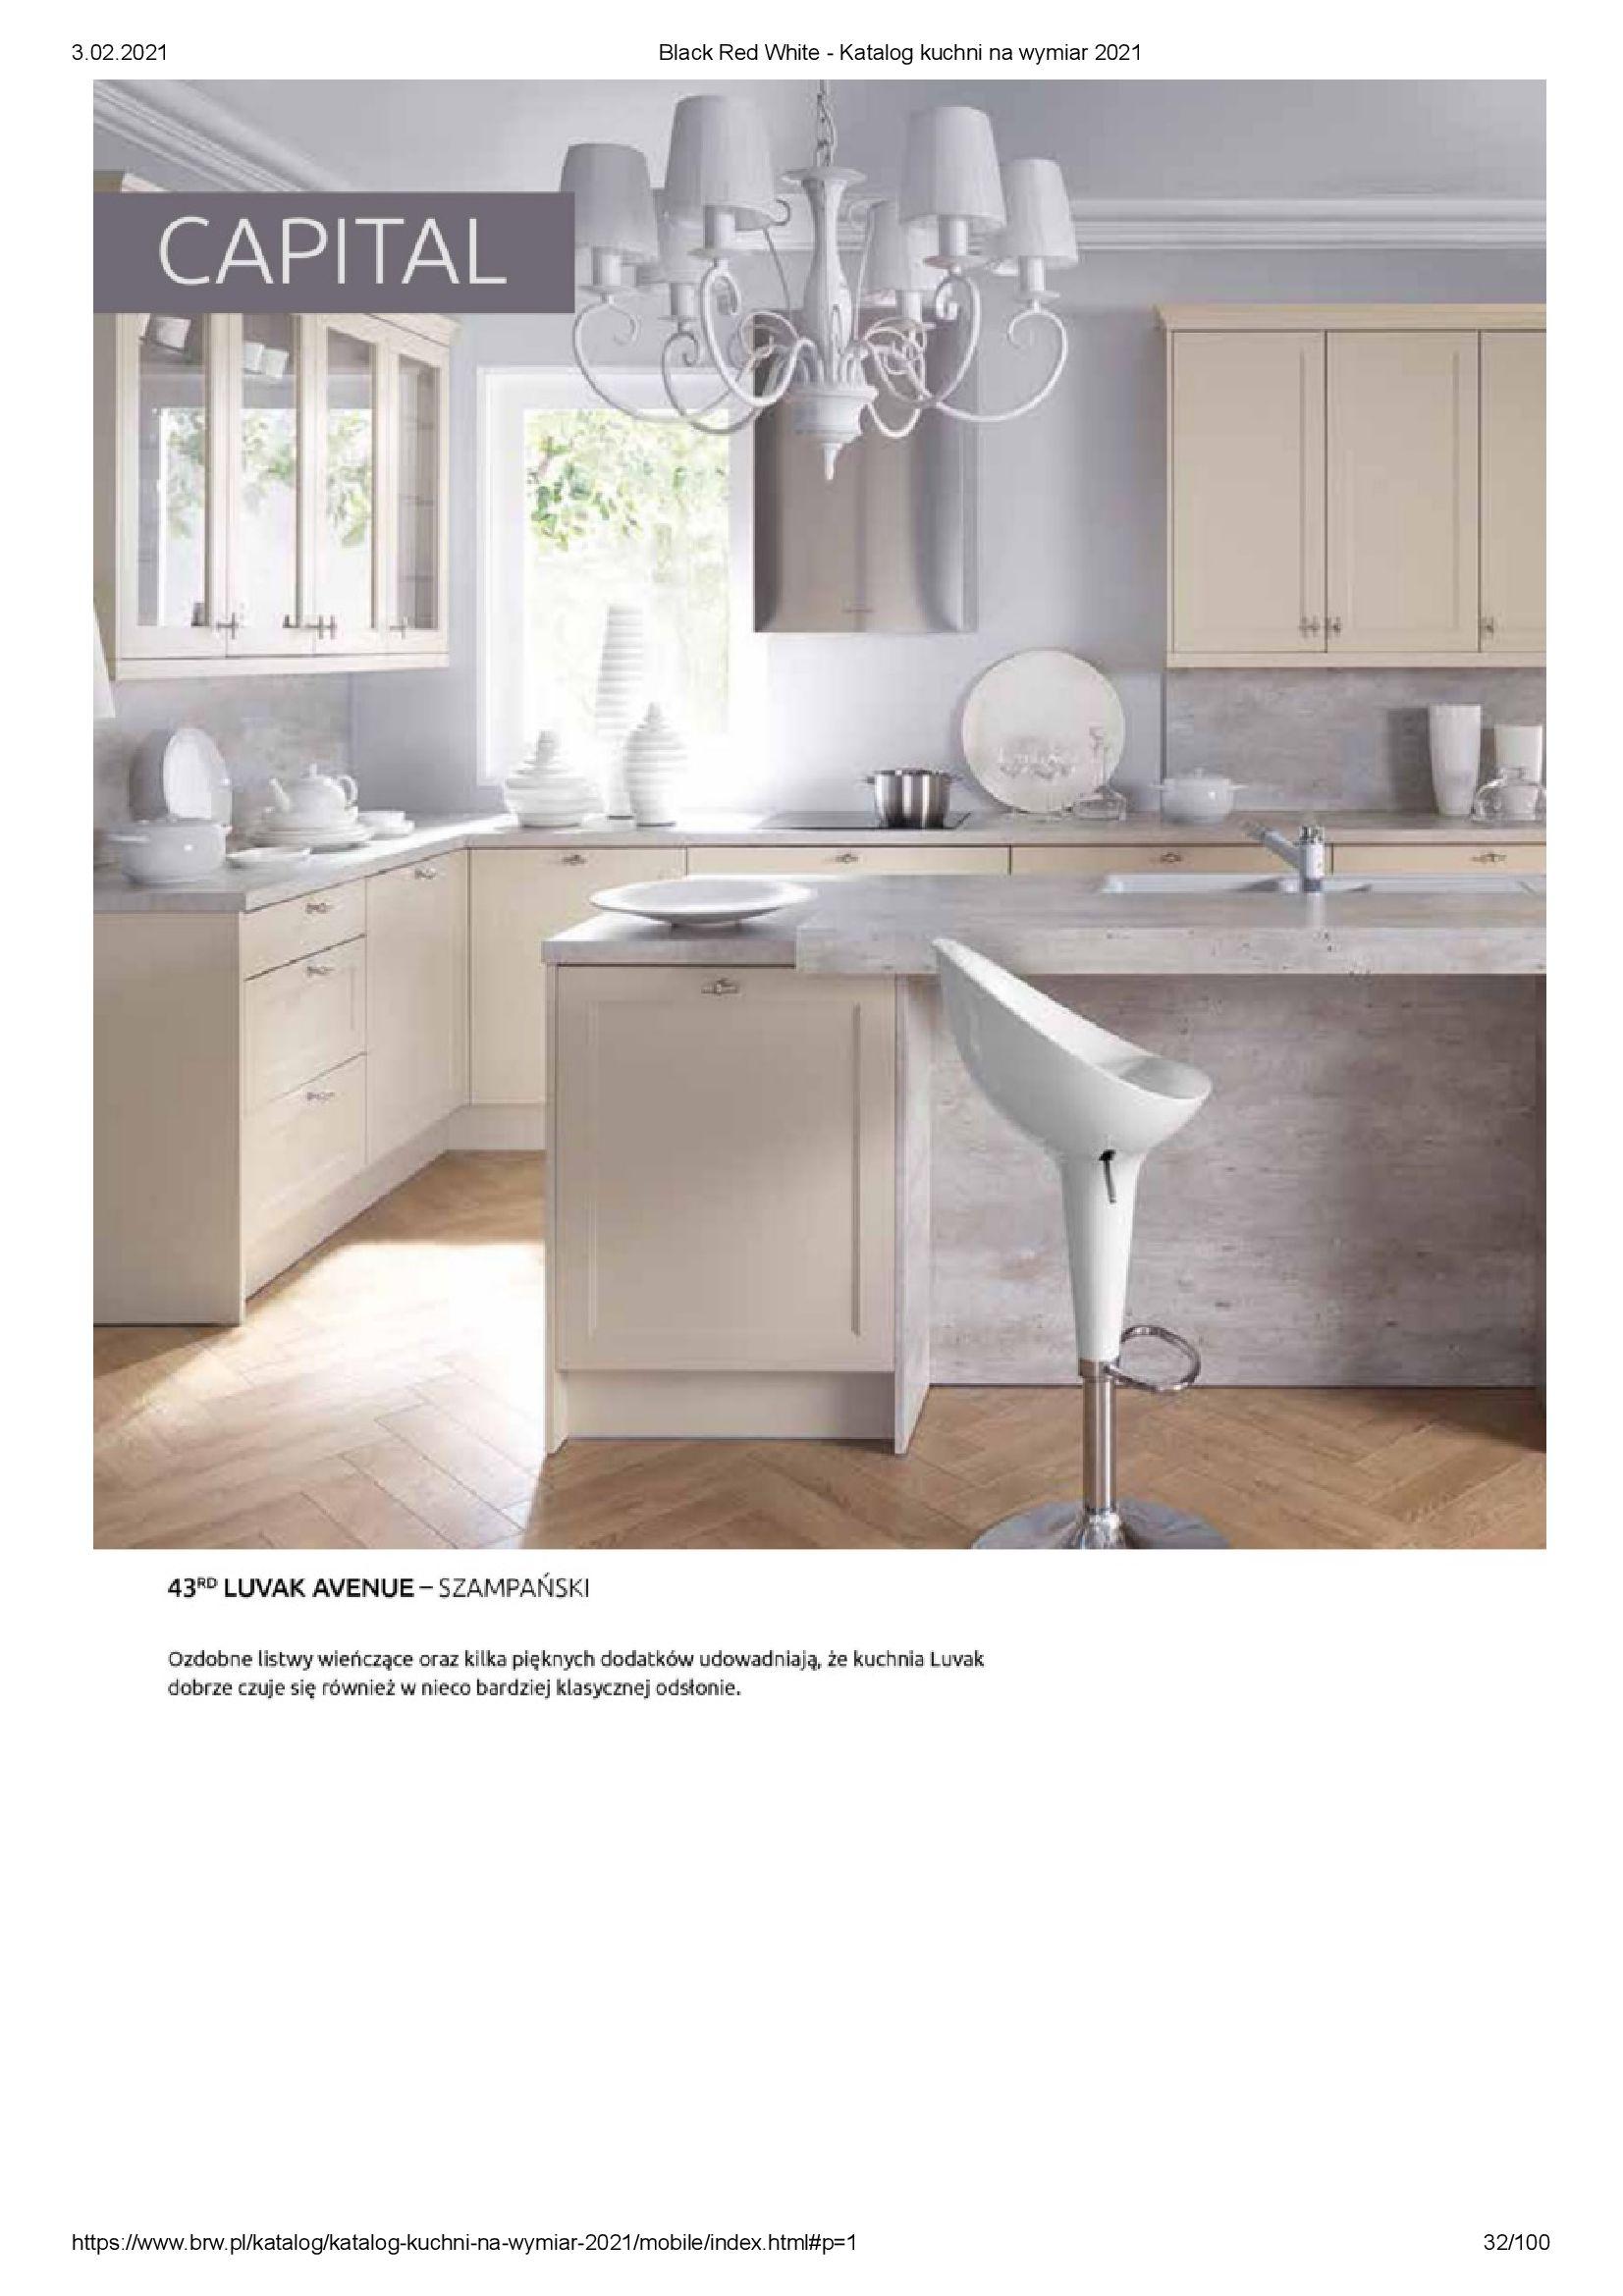 Gazetka Black Red White: Katalog - Kuchnie na wymiar Senso Kitchens 2021 2021-01-01 page-32